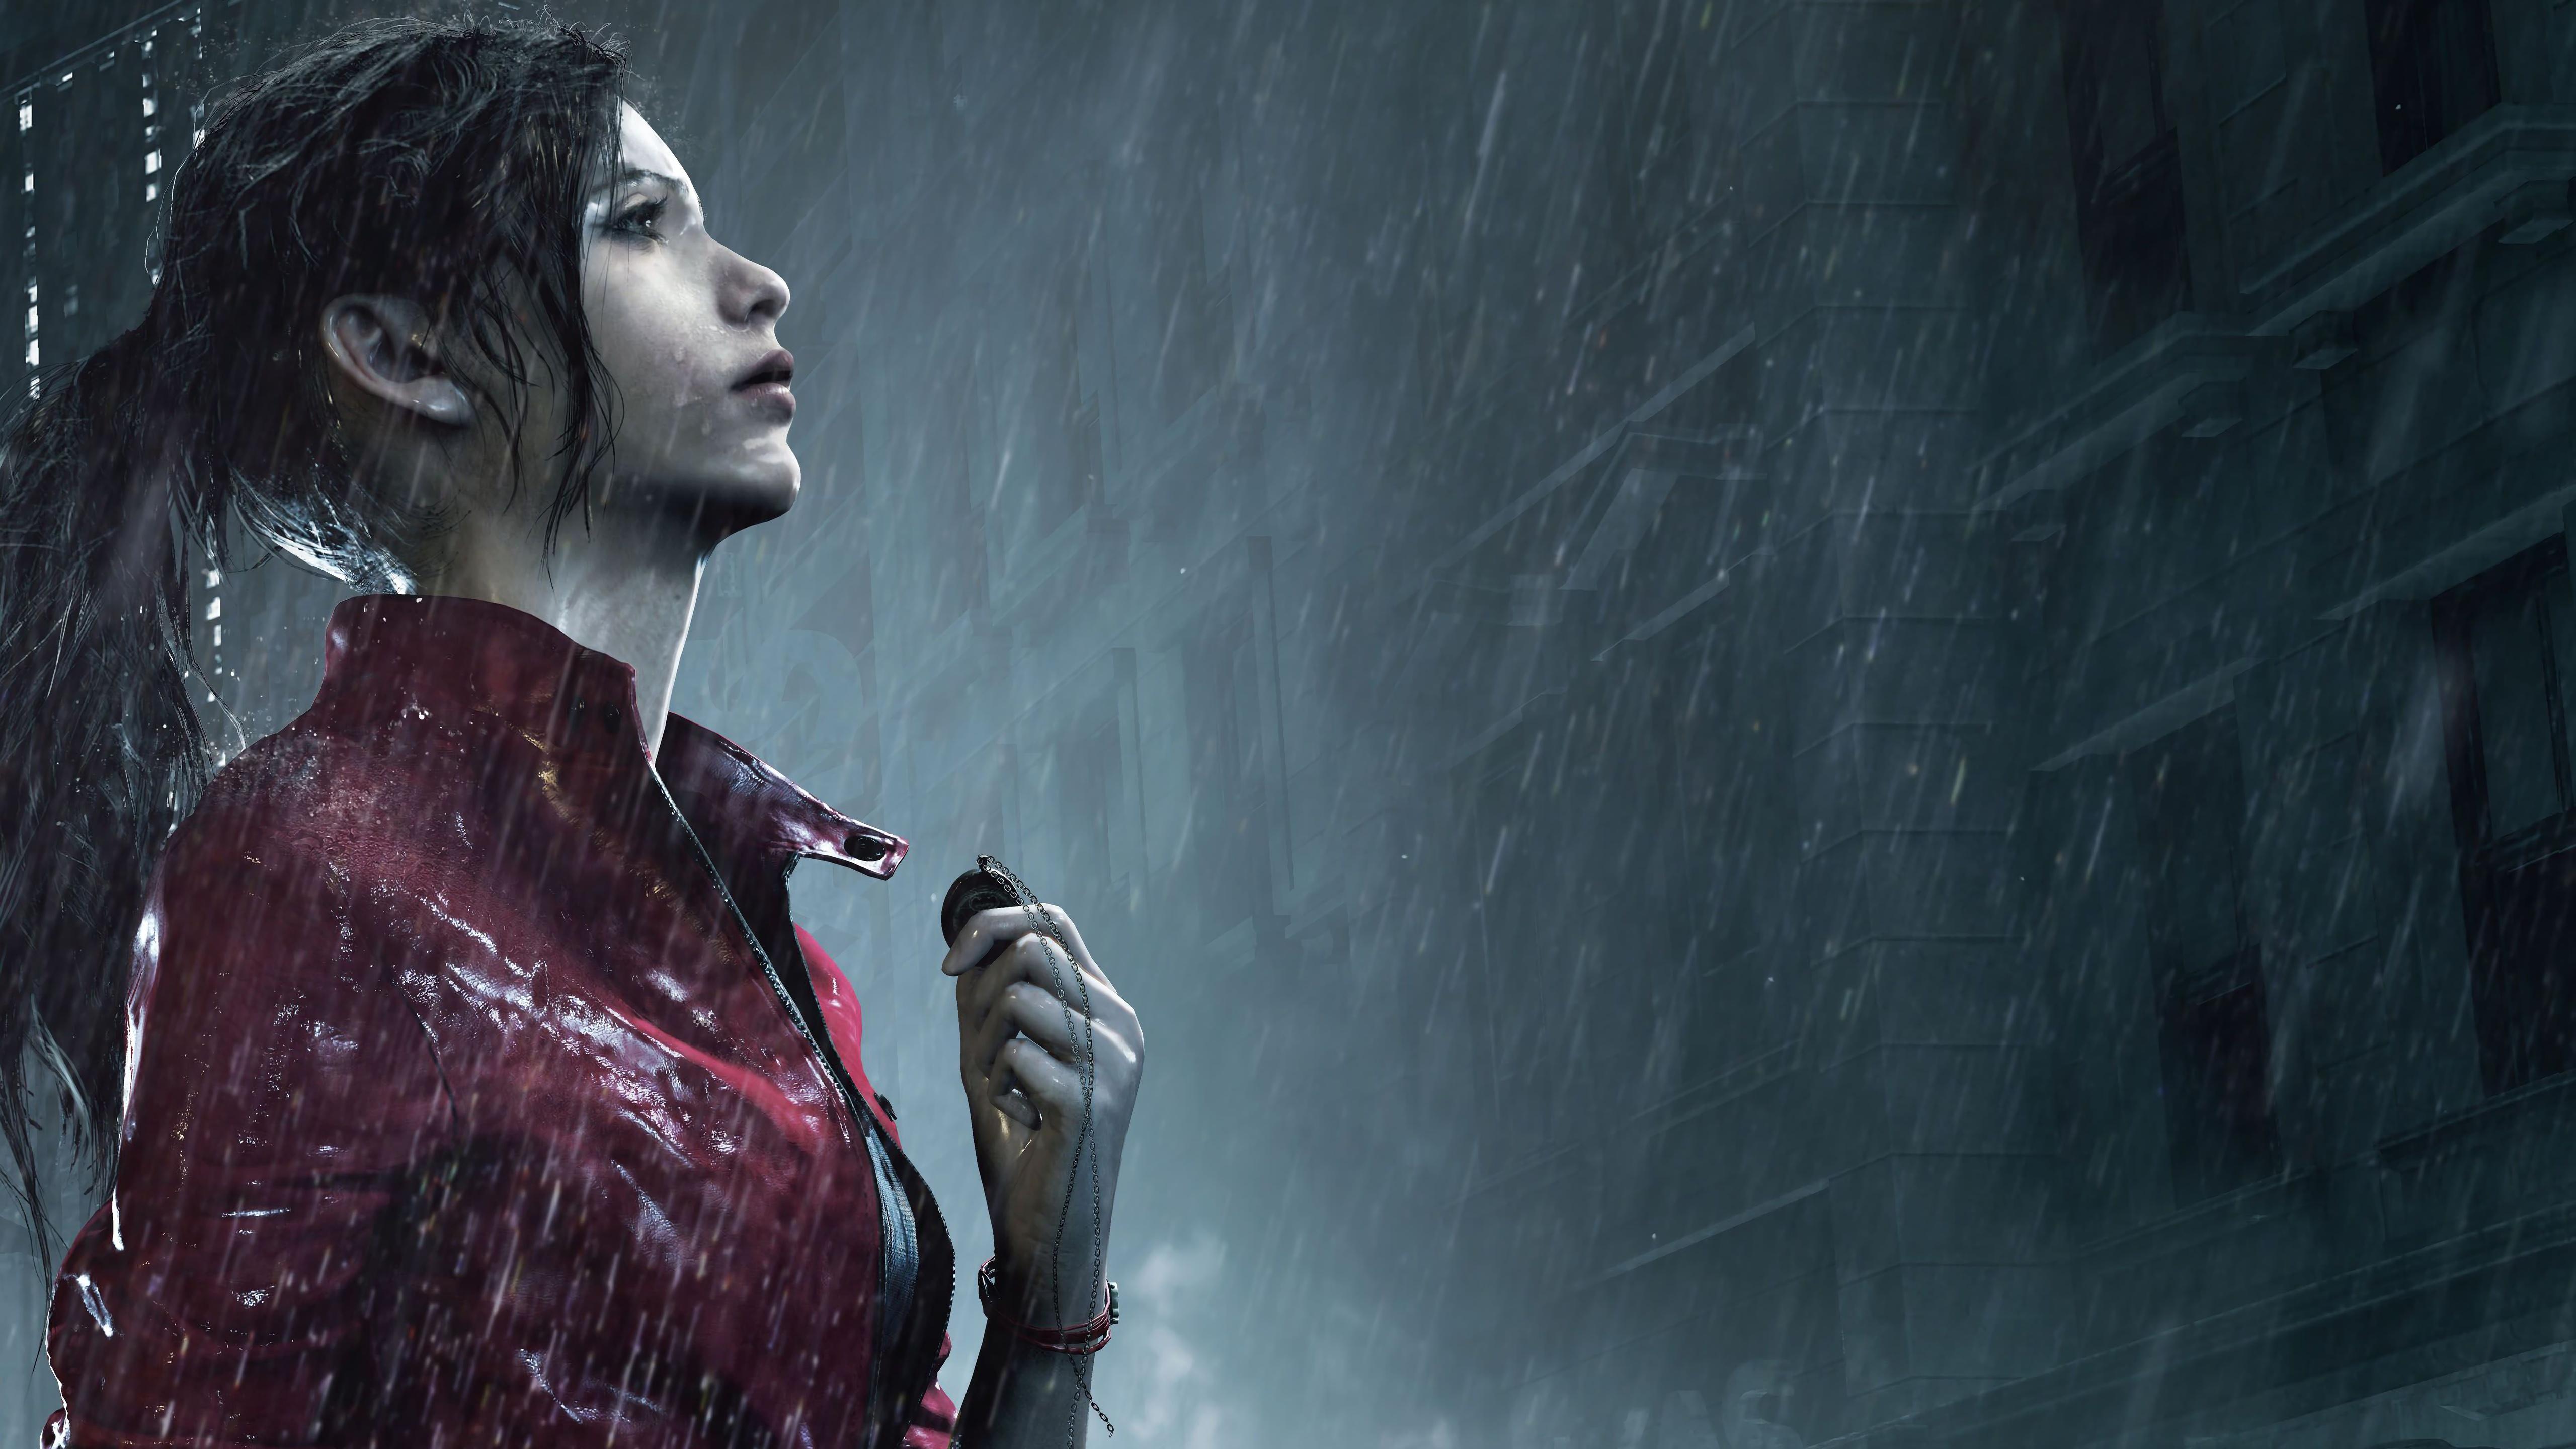 5120x2880 Claire Redfield Resident Evil 2 8k 5k HD 4k